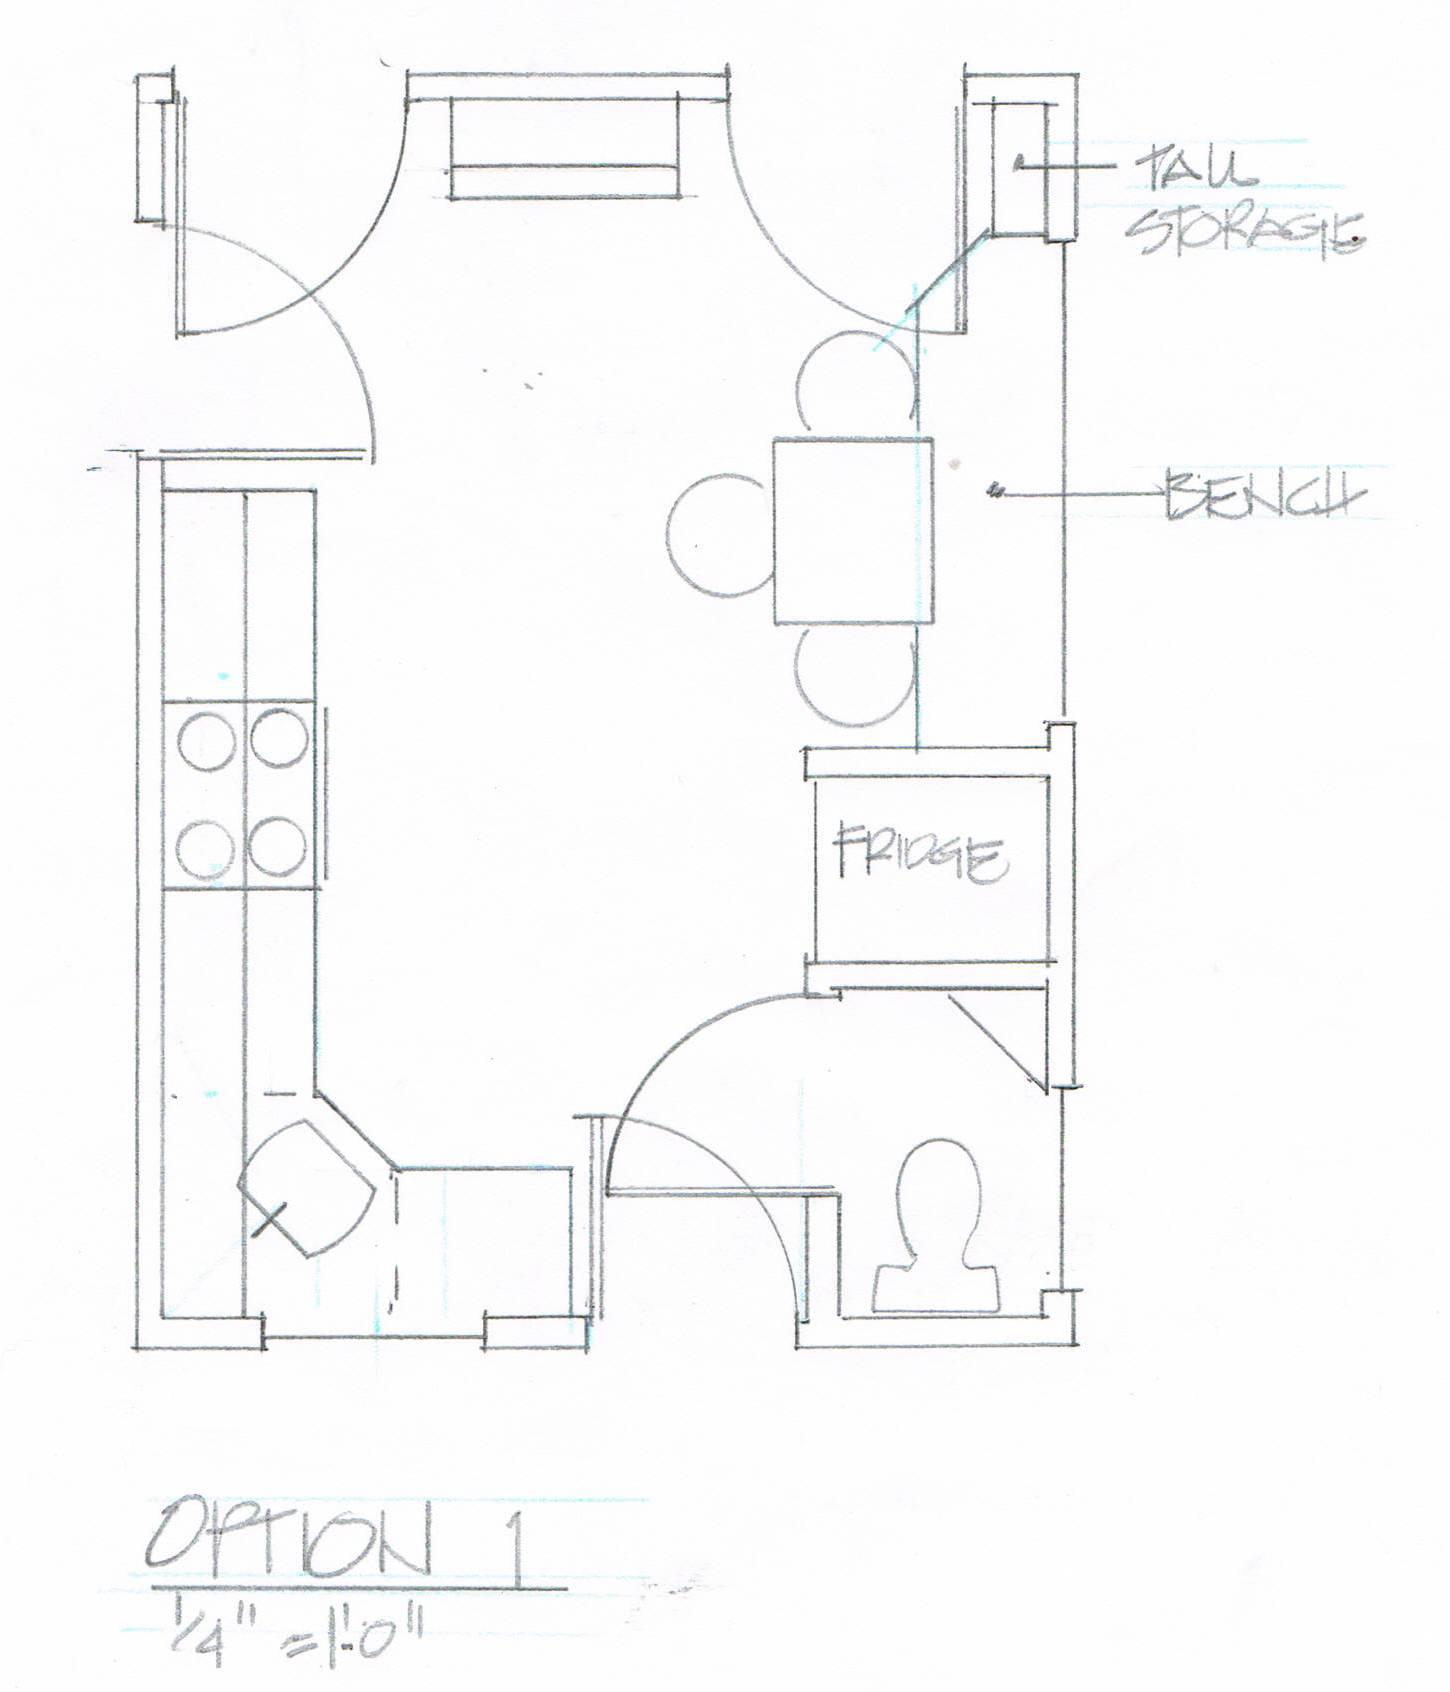 kitchen design layout graph paper - Orgsan.celikdemirsan.com